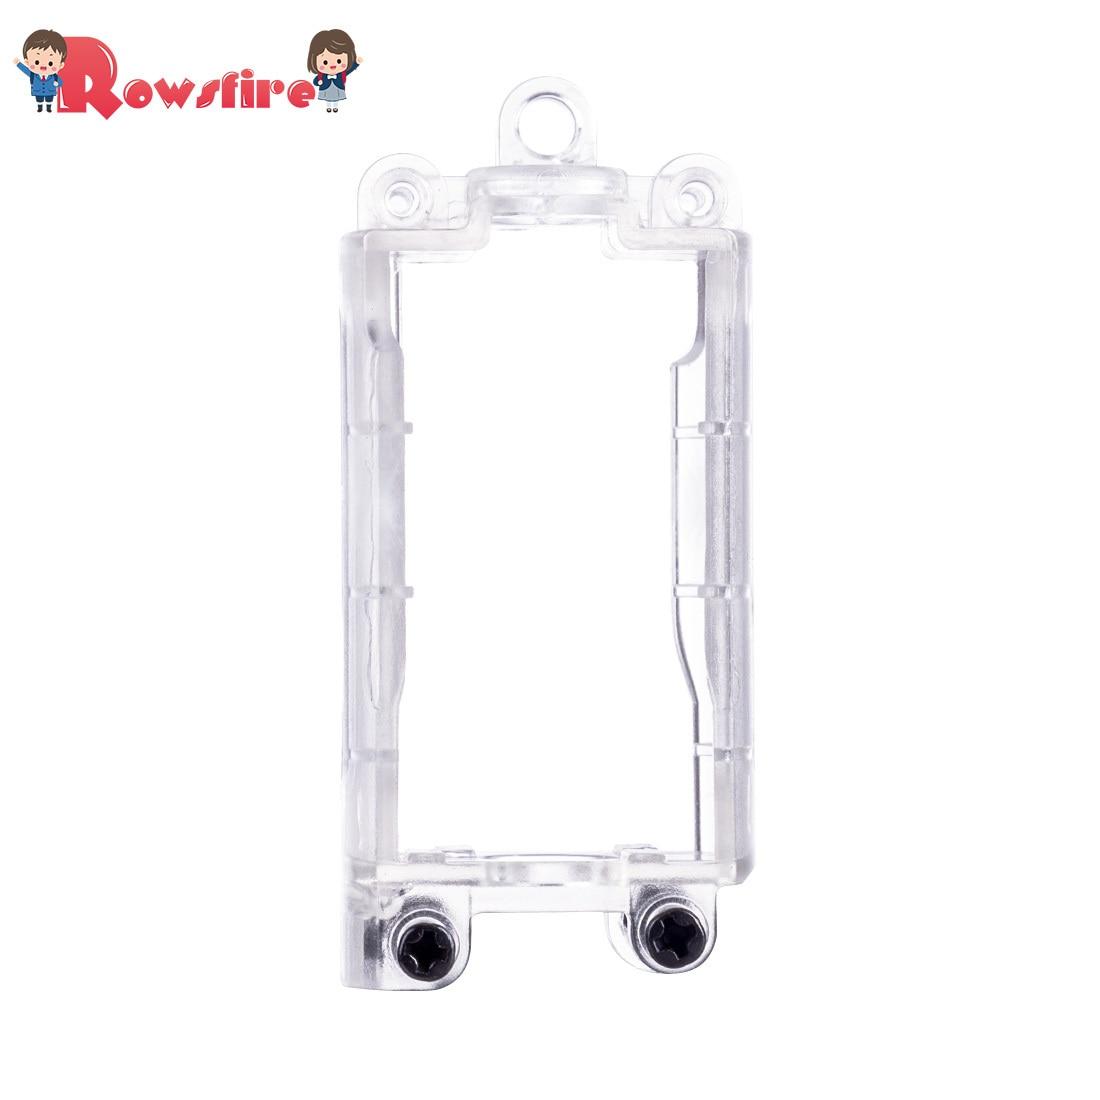 Rowsfire 1 Pcs JM Original Motor Frame For JM Gen.8 M-4A1 Water Gel Beads Blaster Modification Hot Sale - Transparent